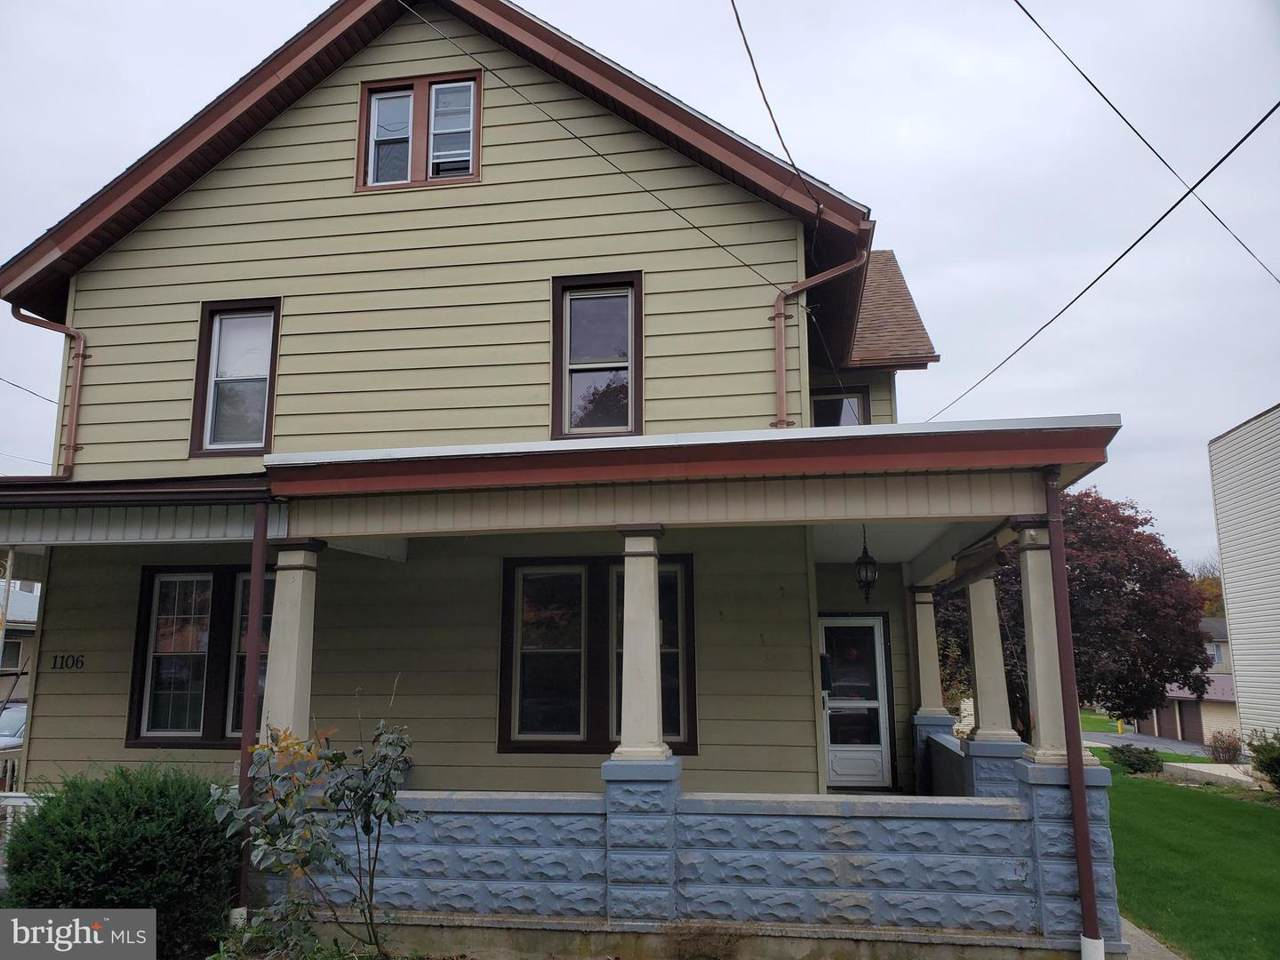 1108 Reinoehl Street - Photo 1